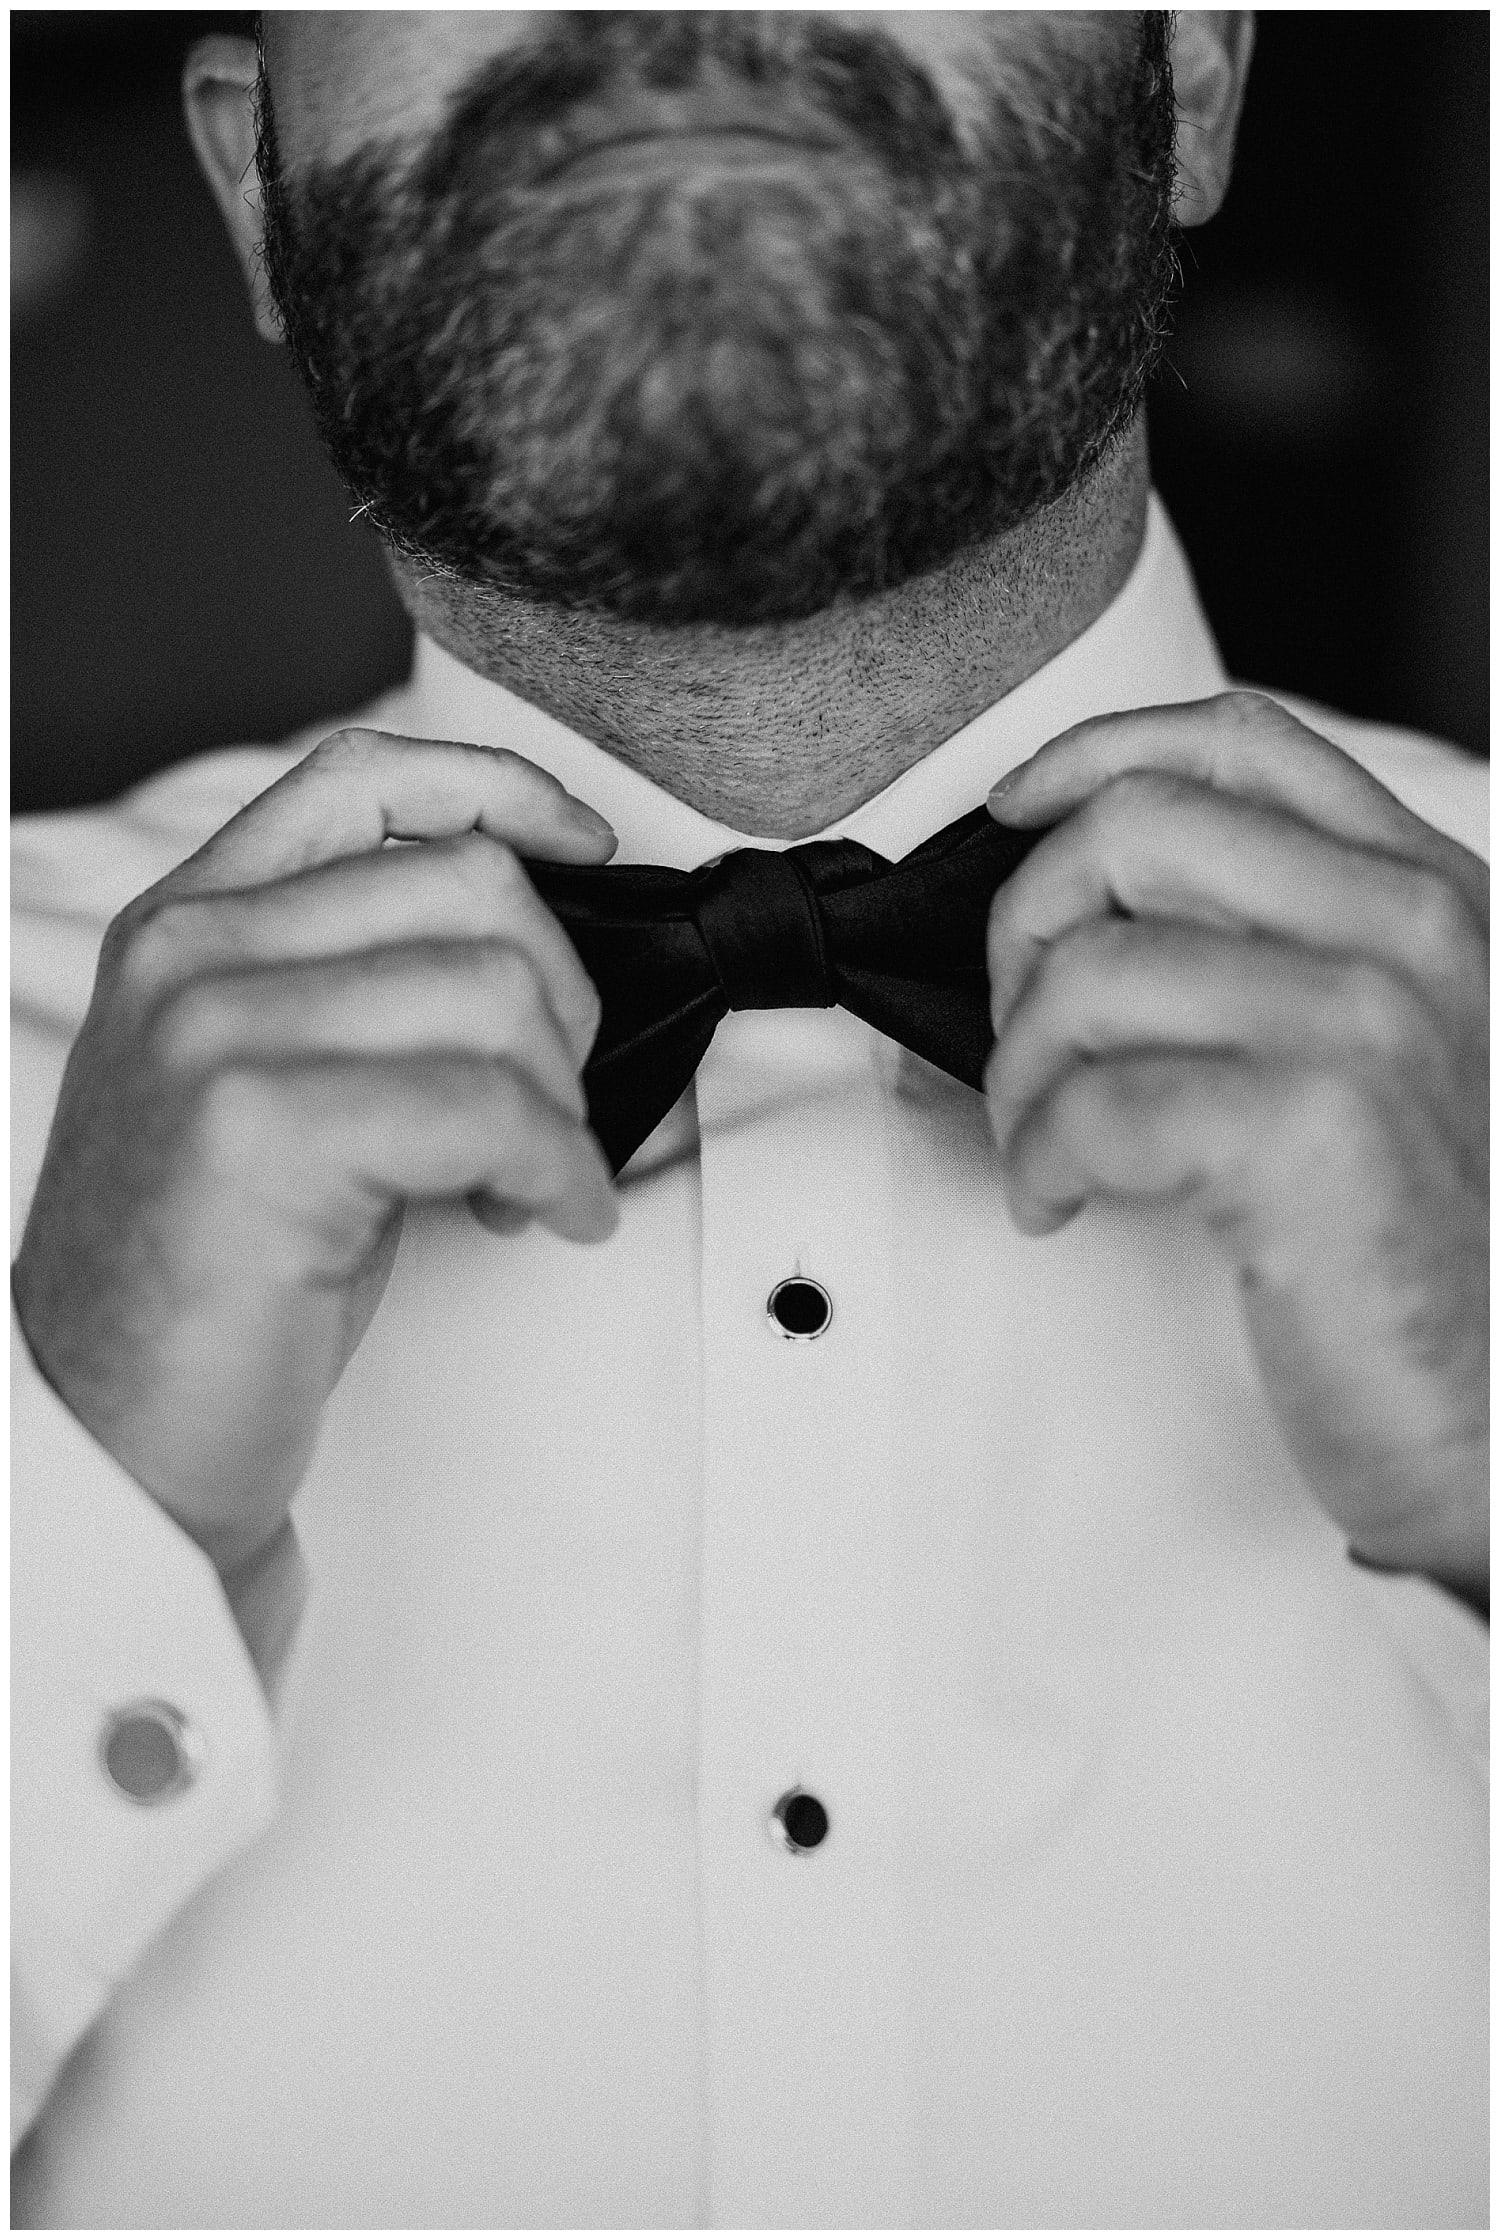 addison wedding,boca raton photographer,boca raton wedding,boca raton wedding photographer,coronavirus wedding,covid wedding,covid19 wedding,delray wedding photographer,fort lauderdale photographer,fort lauderdale wedding photographer,miami photographer,miami wedding photographer,stuart wedding photographer,the addision boca raton,the addison,the addison wedding,wedding at the addison,